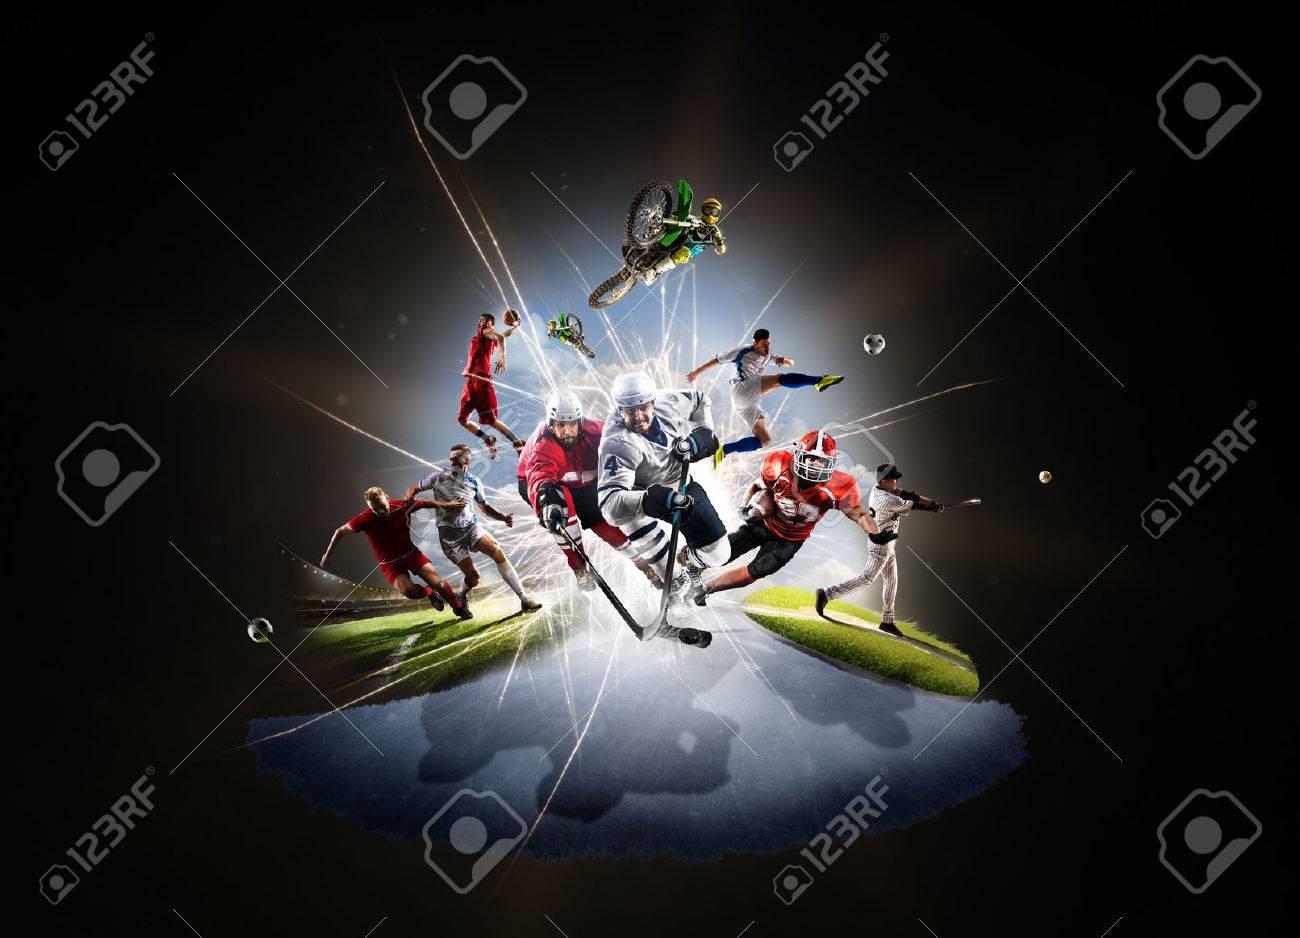 Multi sports collage from soccer basketball hockey footbal baseball dirt bike - 59848988